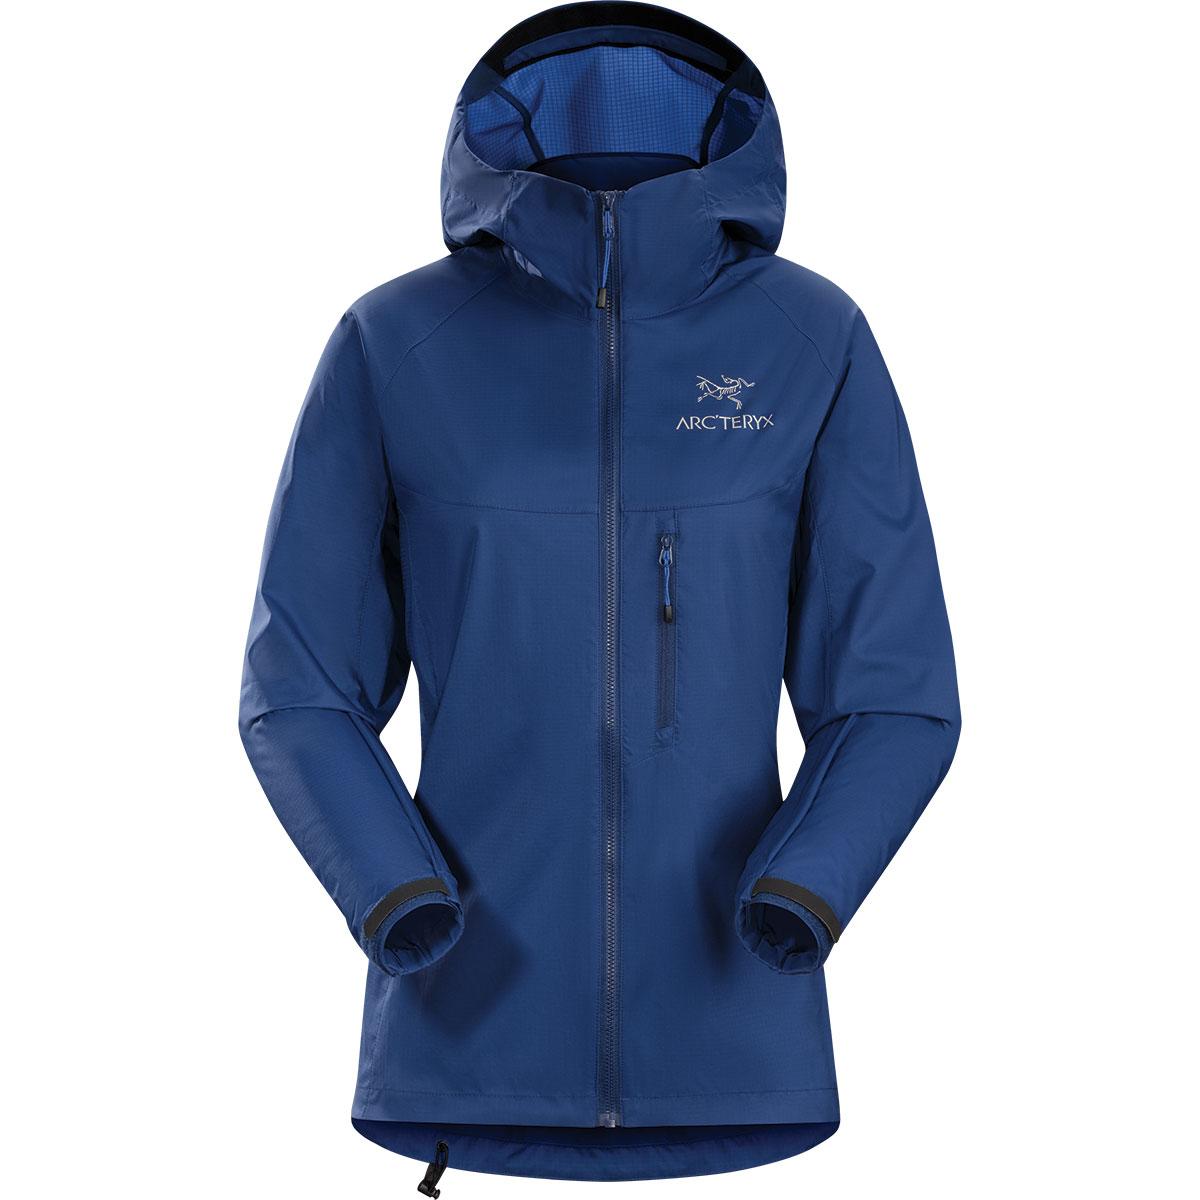 Squamish hoody